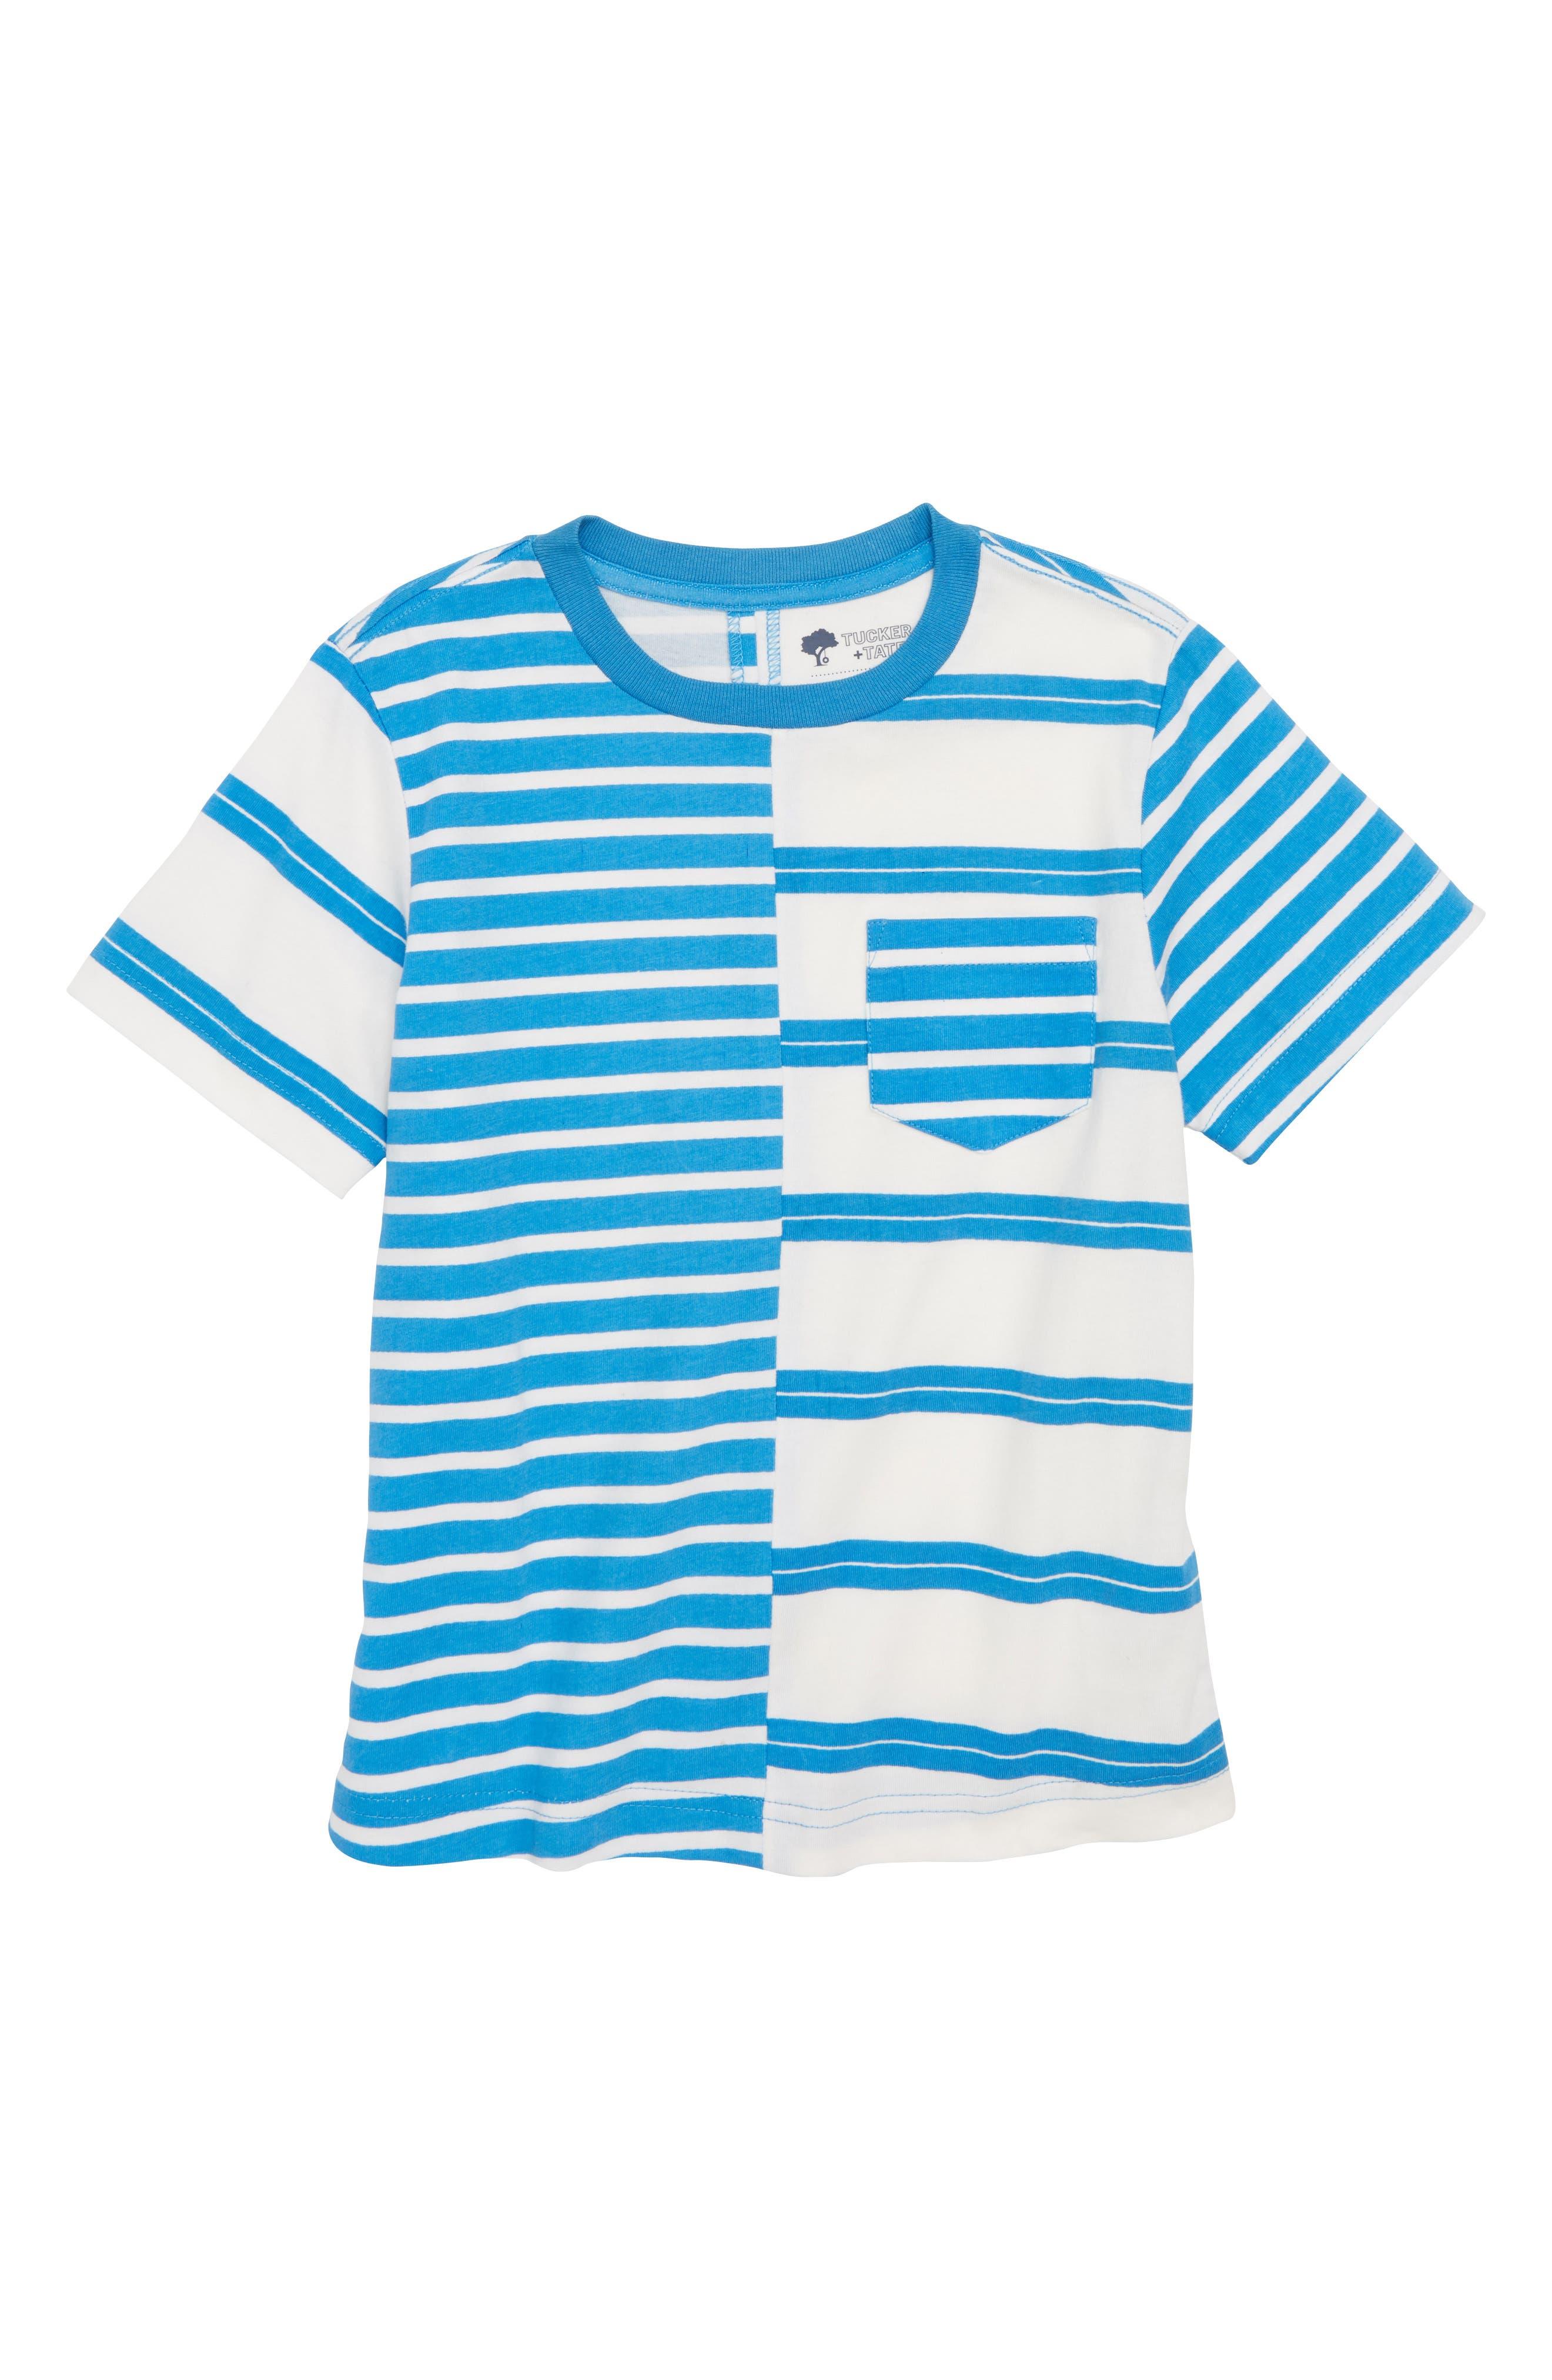 Spliced Stripe T-Shirt,                             Main thumbnail 1, color,                             Blue French- White